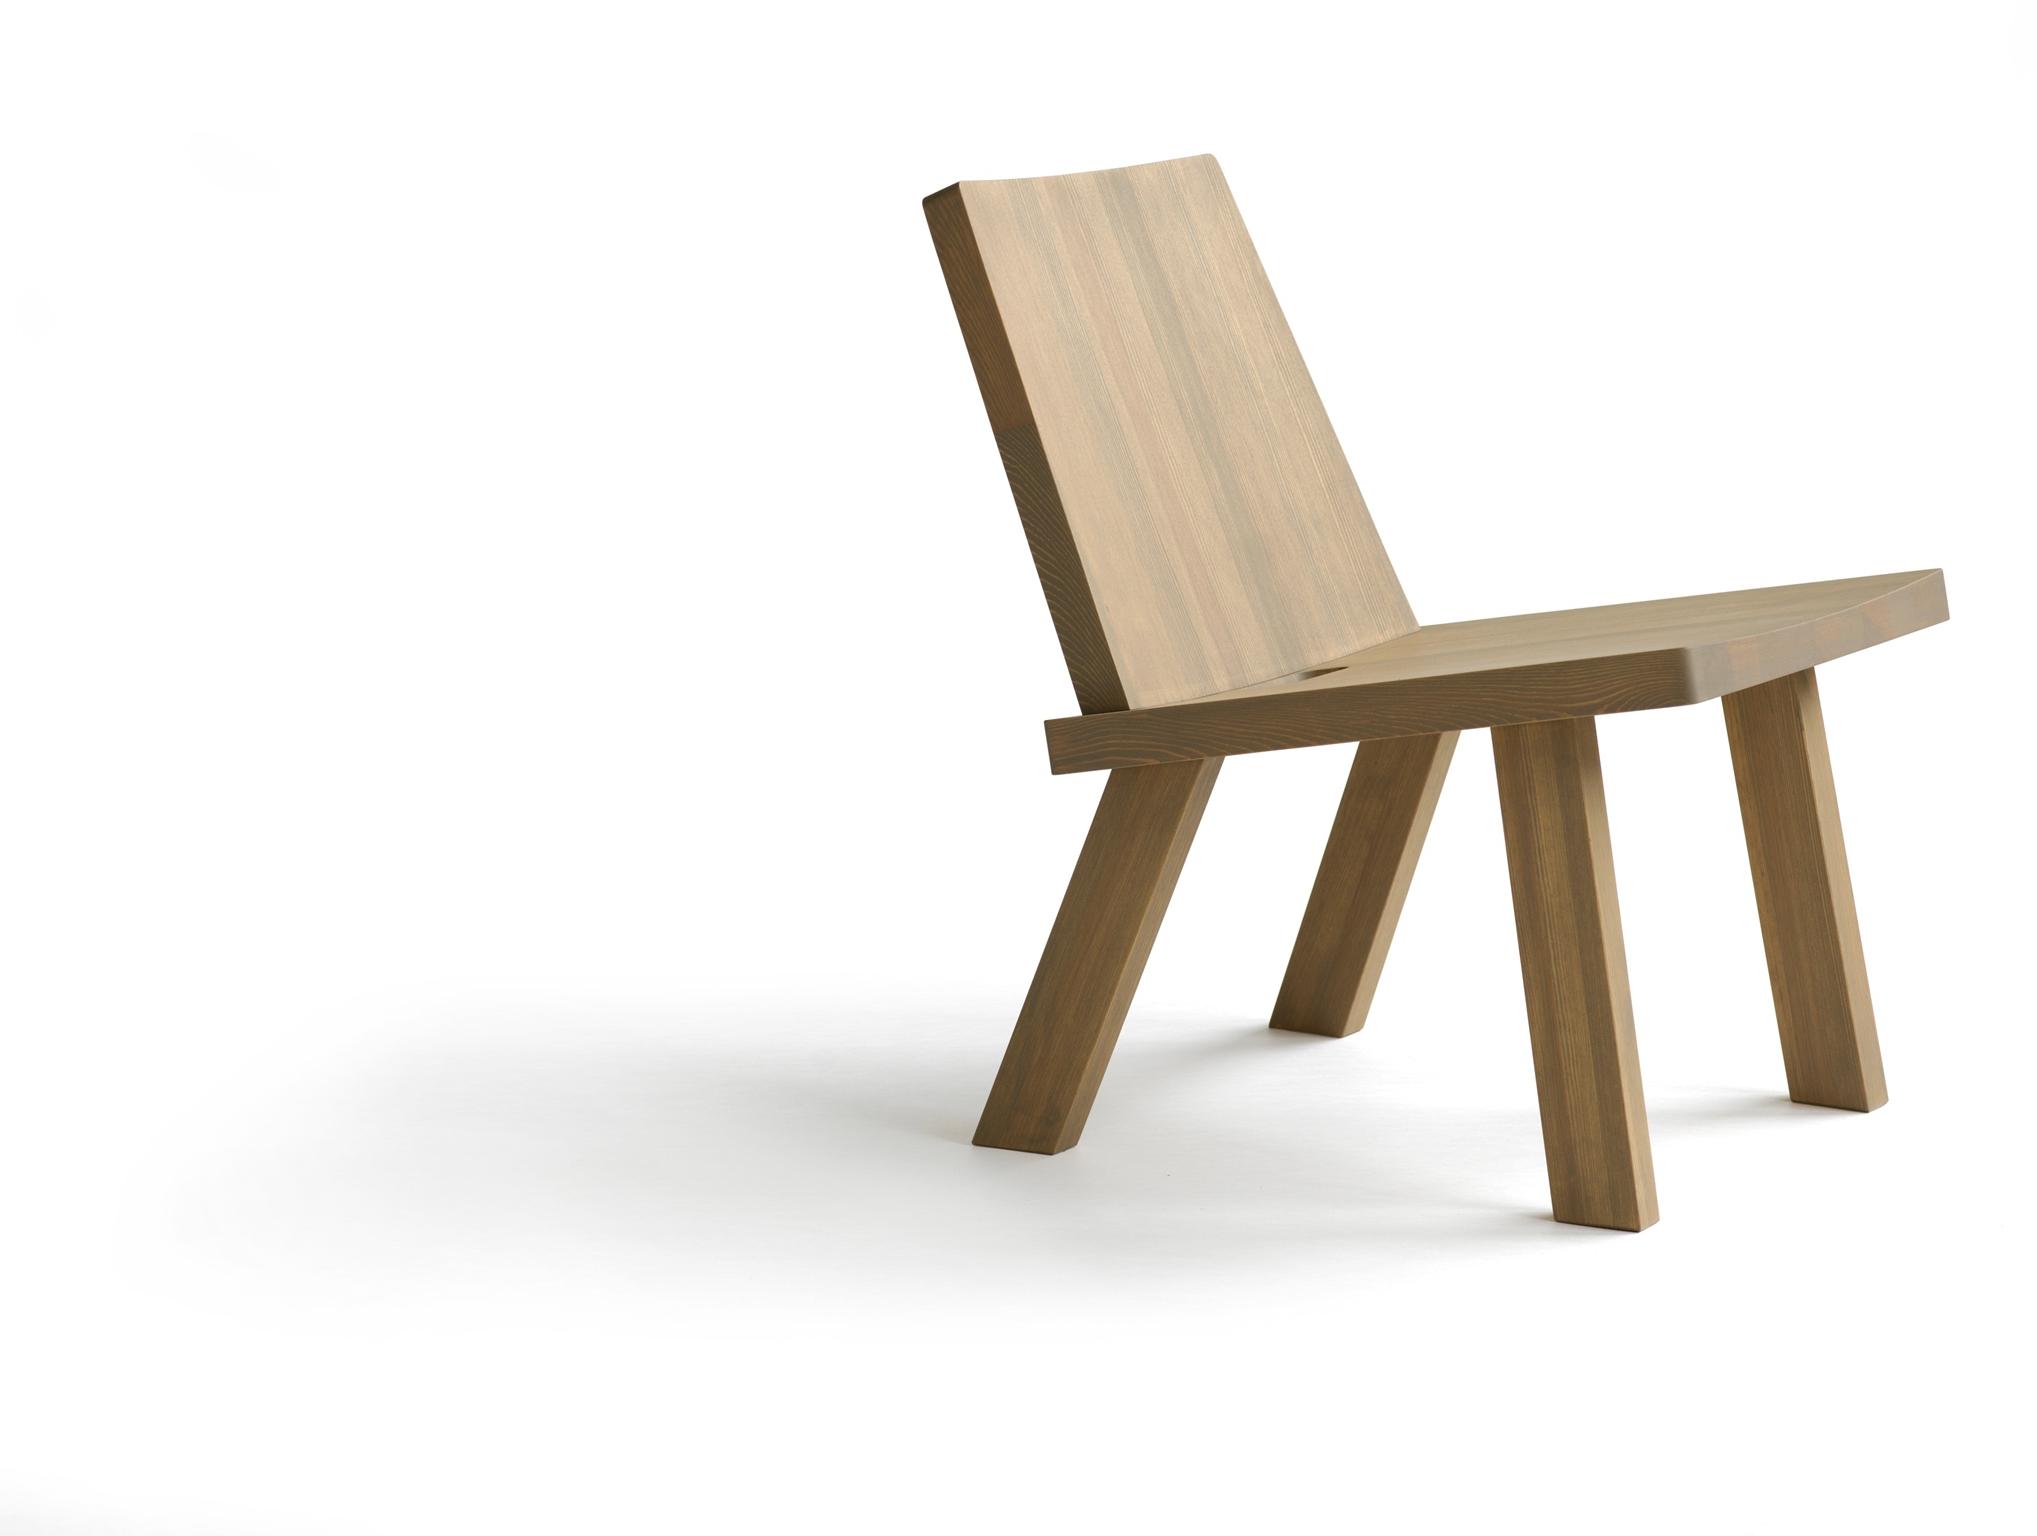 Peachy Products Bla Station Inzonedesignstudio Interior Chair Design Inzonedesignstudiocom